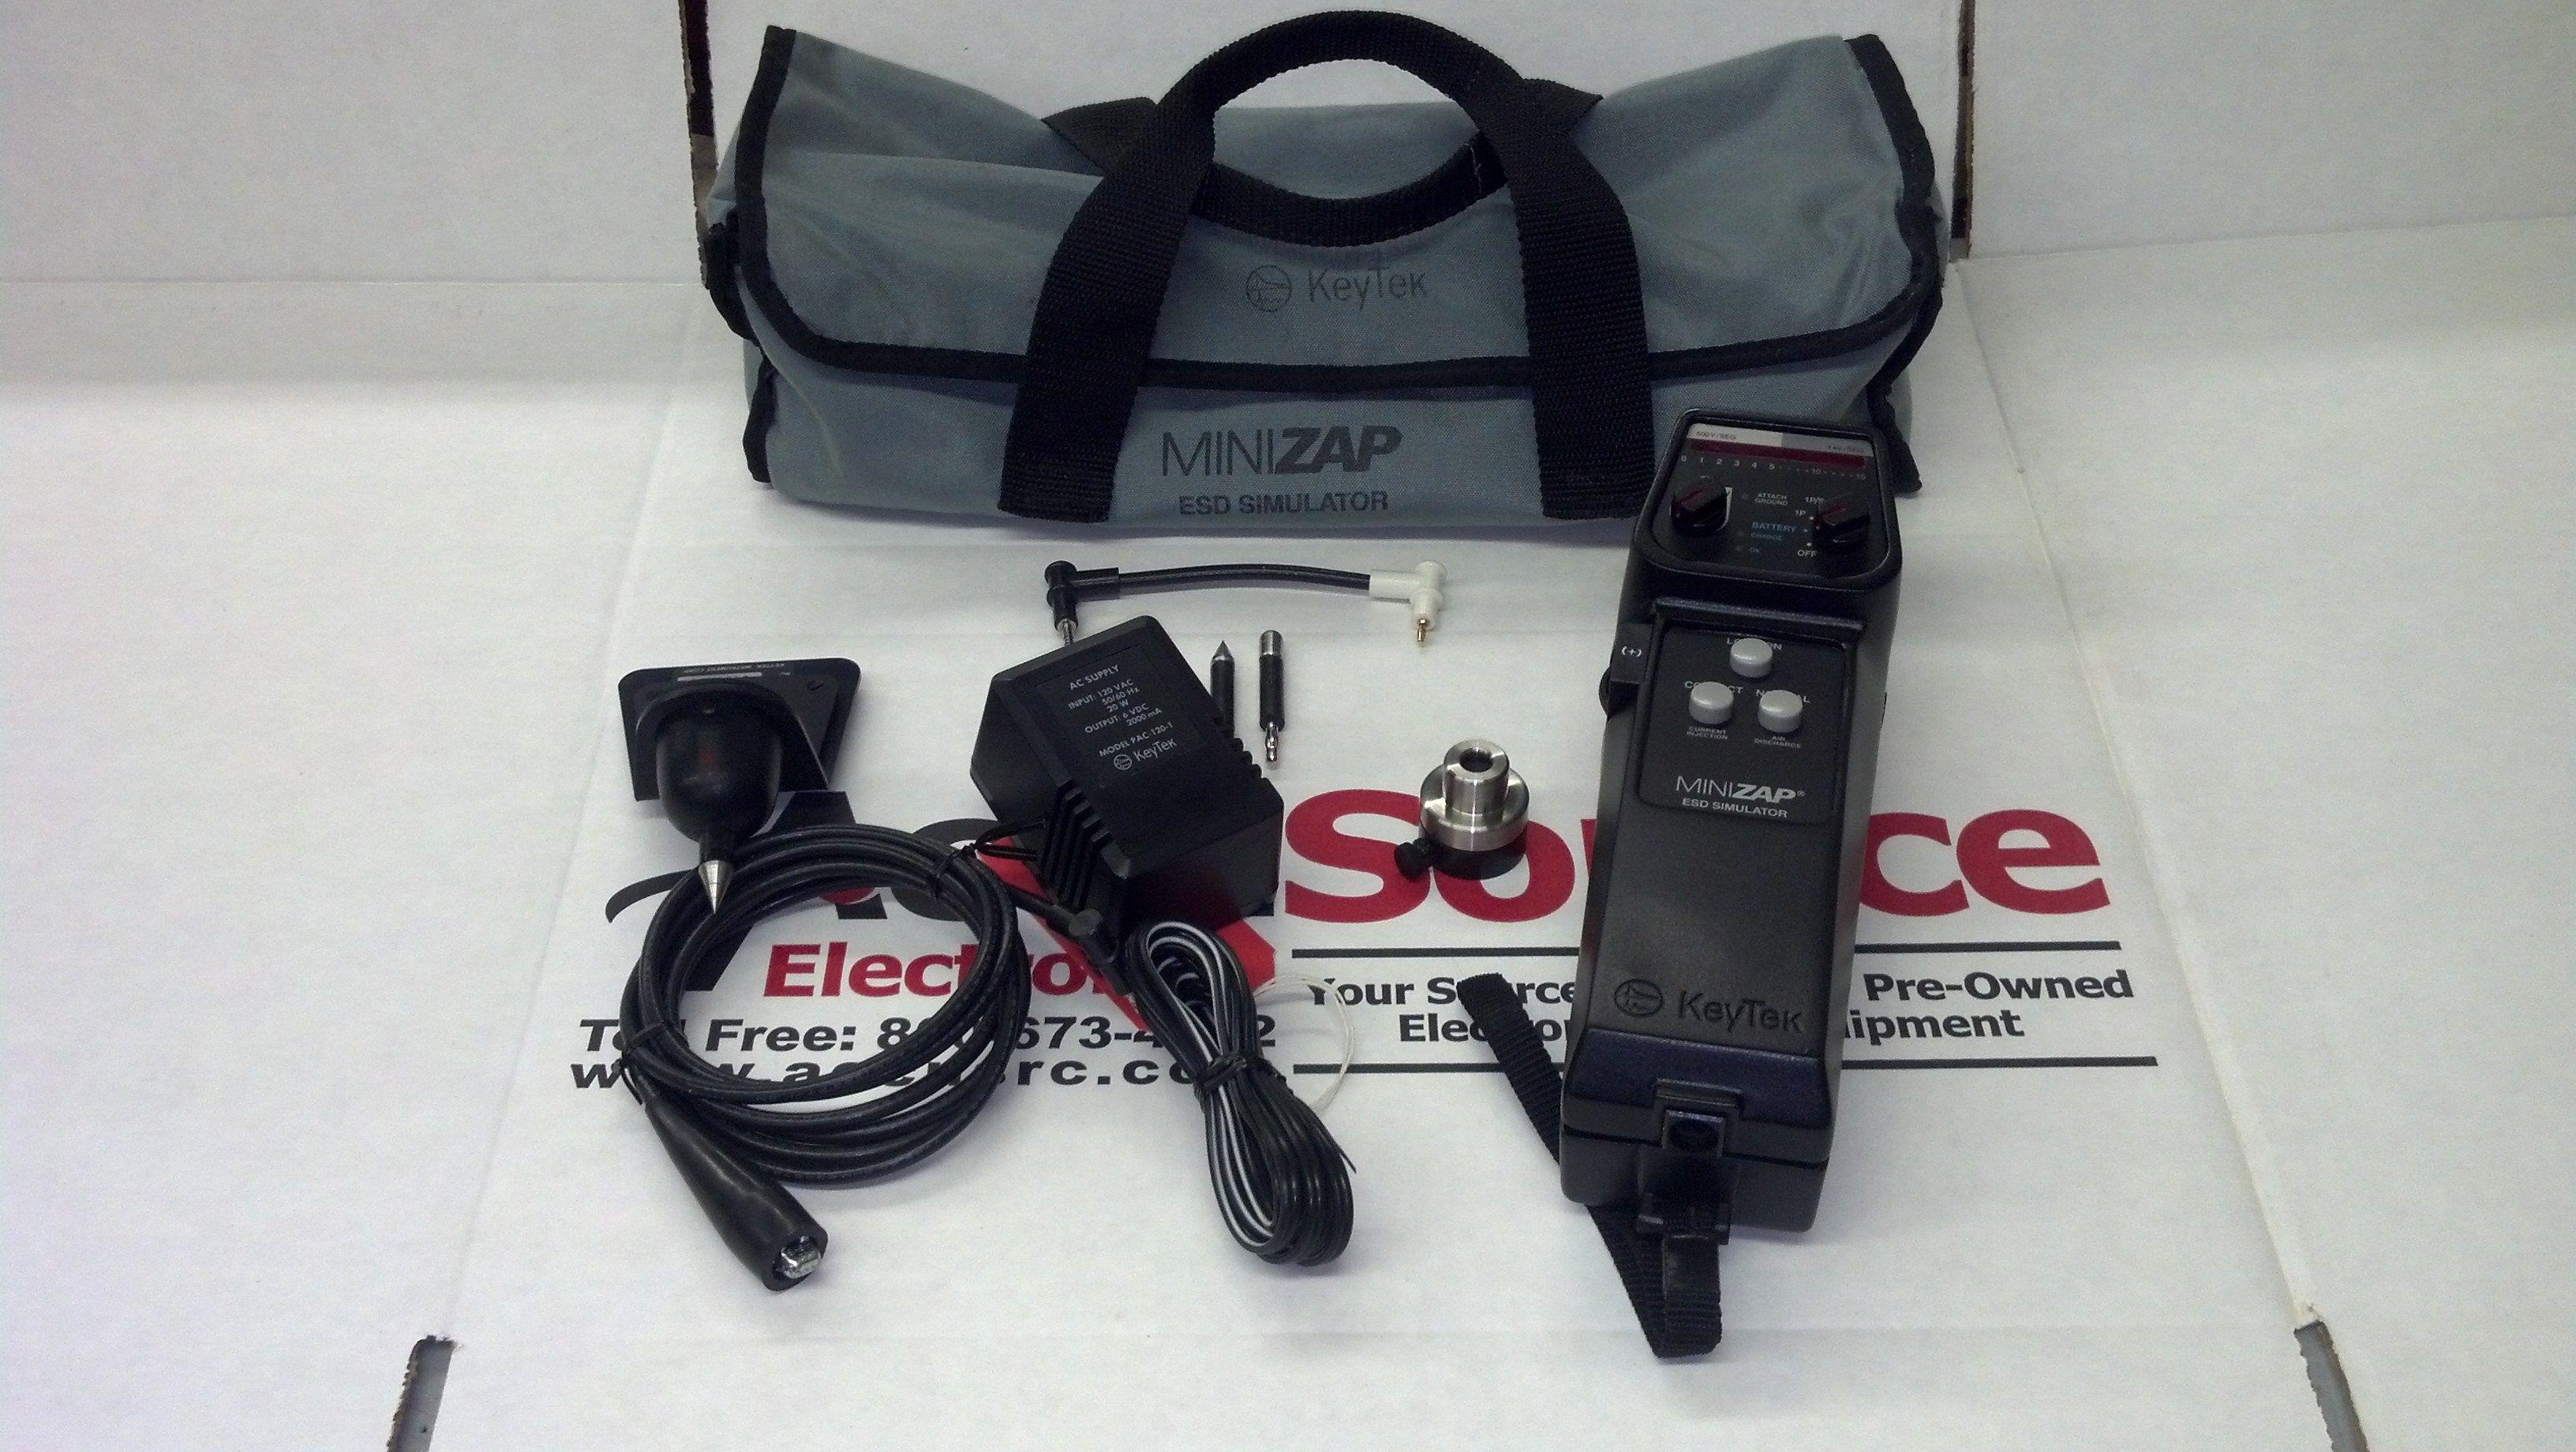 KeyTek MZ15 Minizap ESD Simulator. +/- 15 kV (10 kV in contact mode). $2495.00